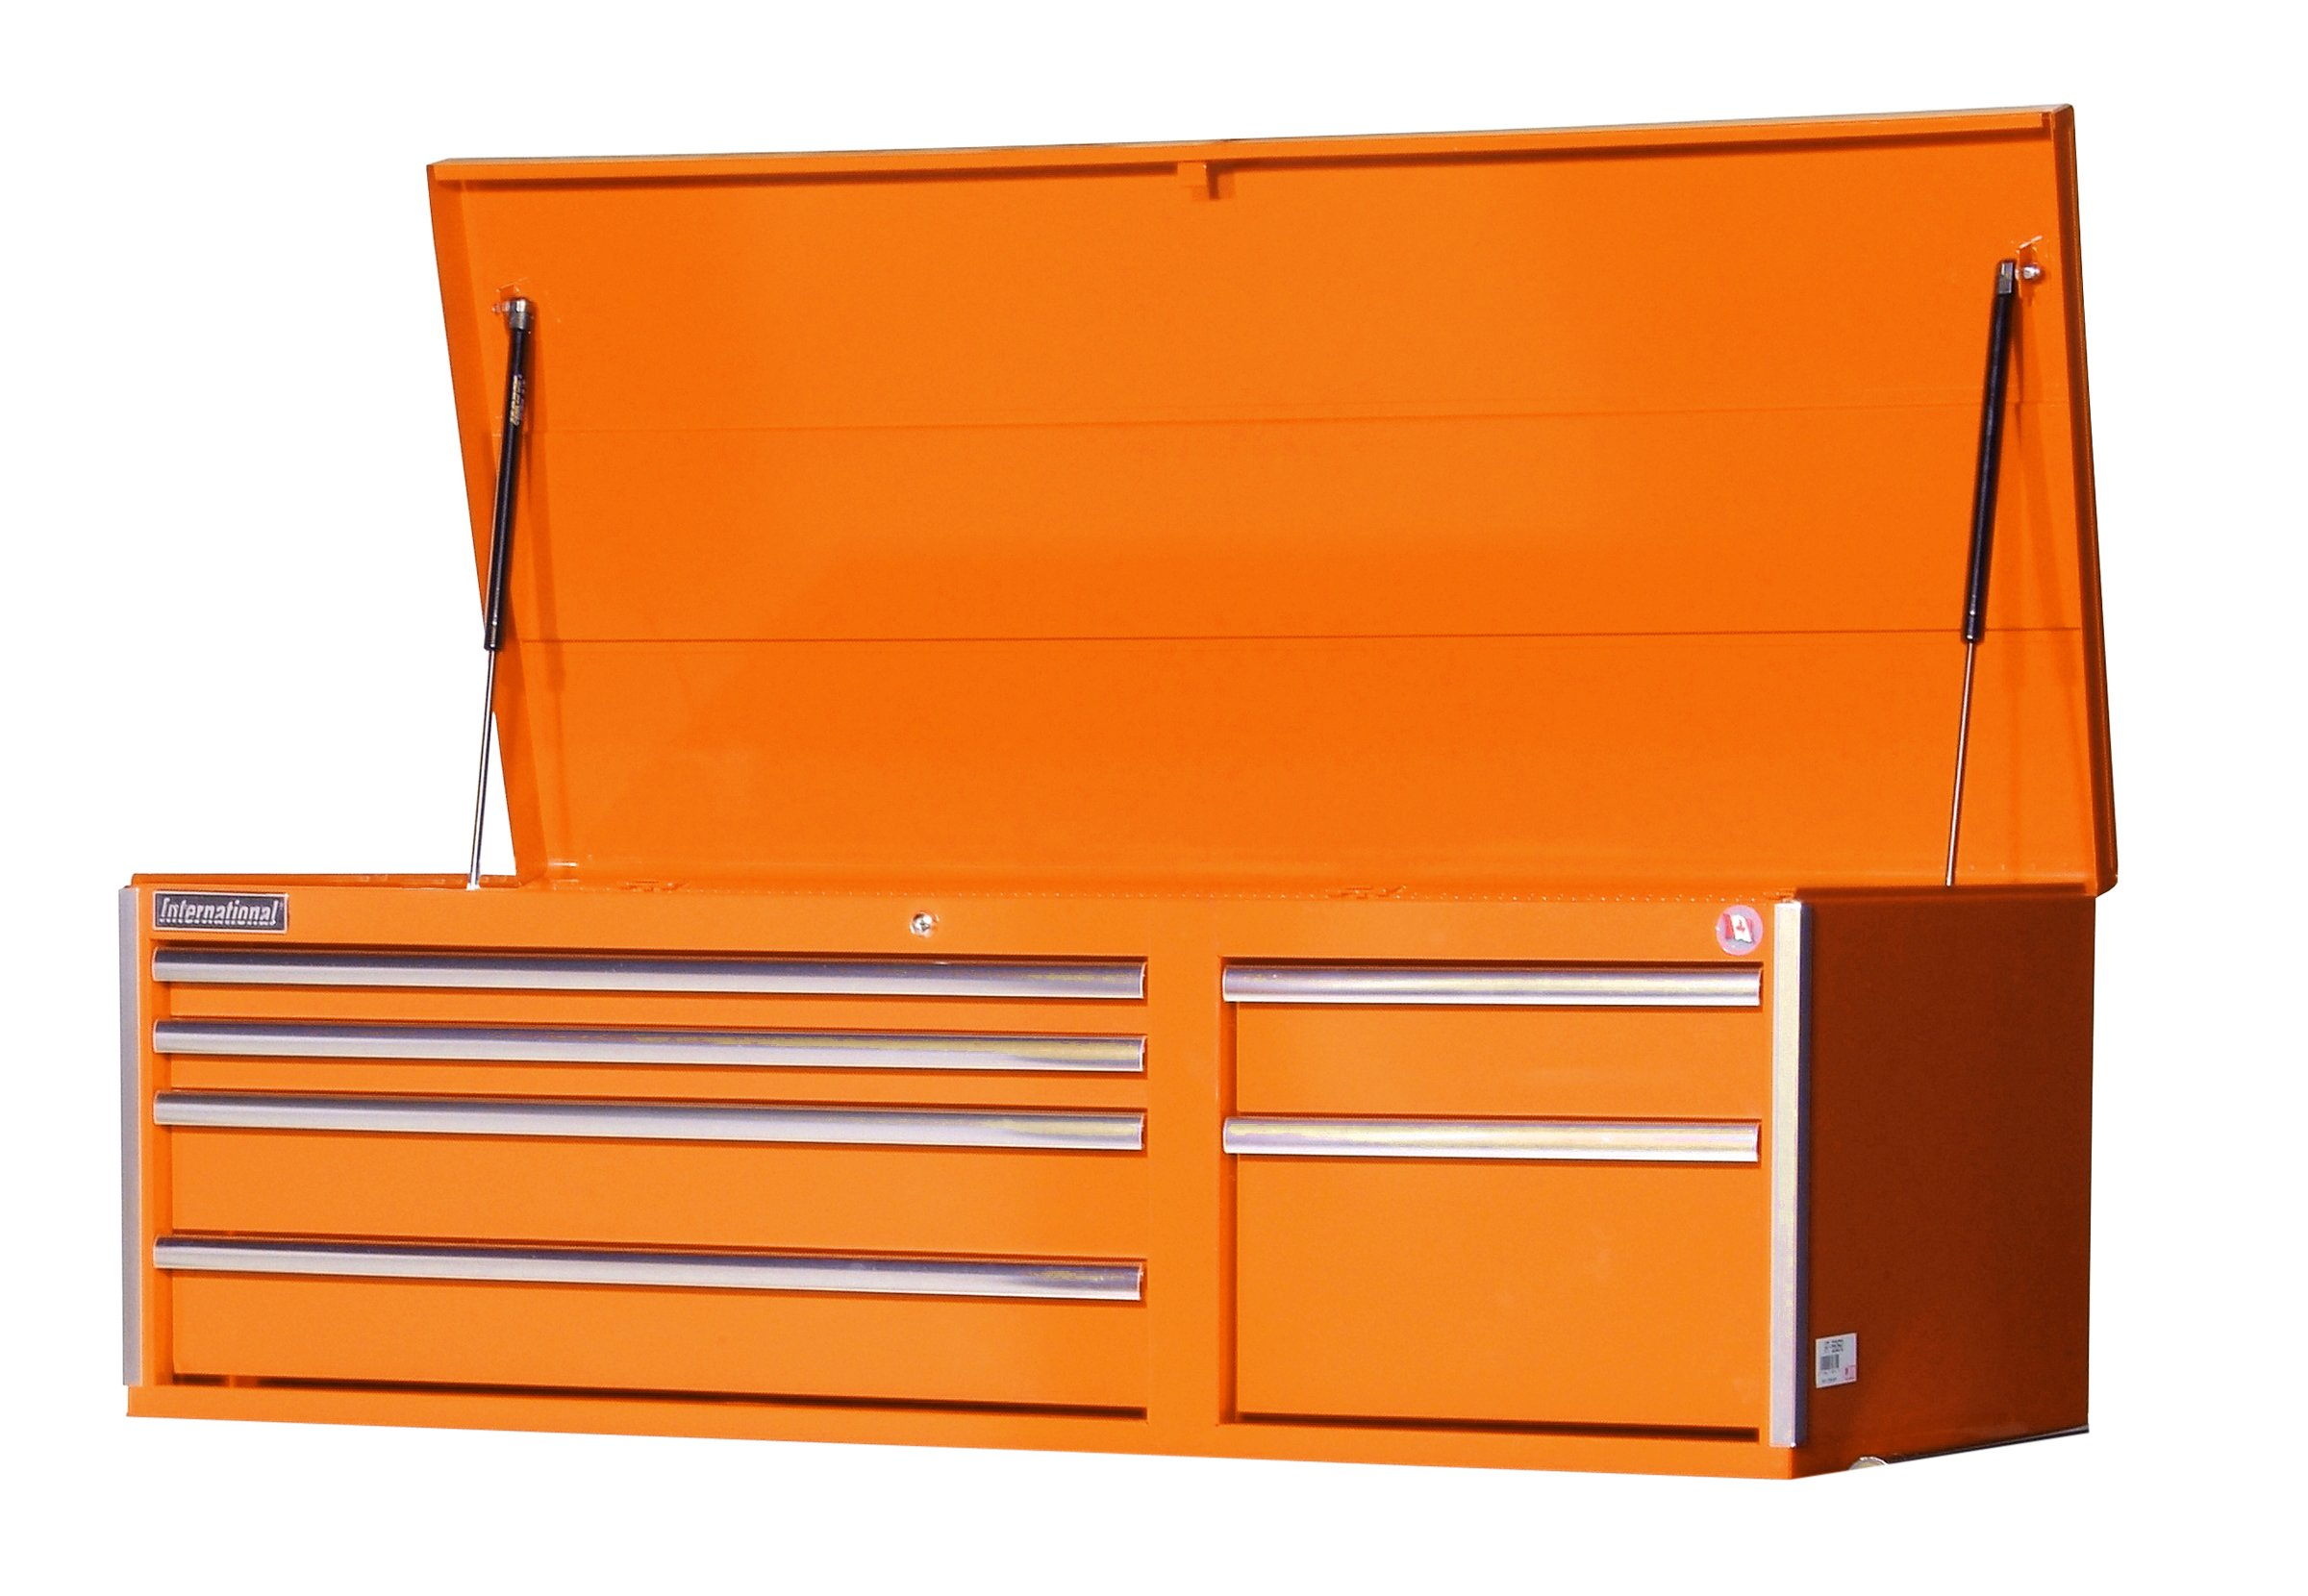 International VRT-5606OR 56-Inch 6 Drawer Orange Tool Cabinet with Heavy Duty Ball Bearing Drawer Slides